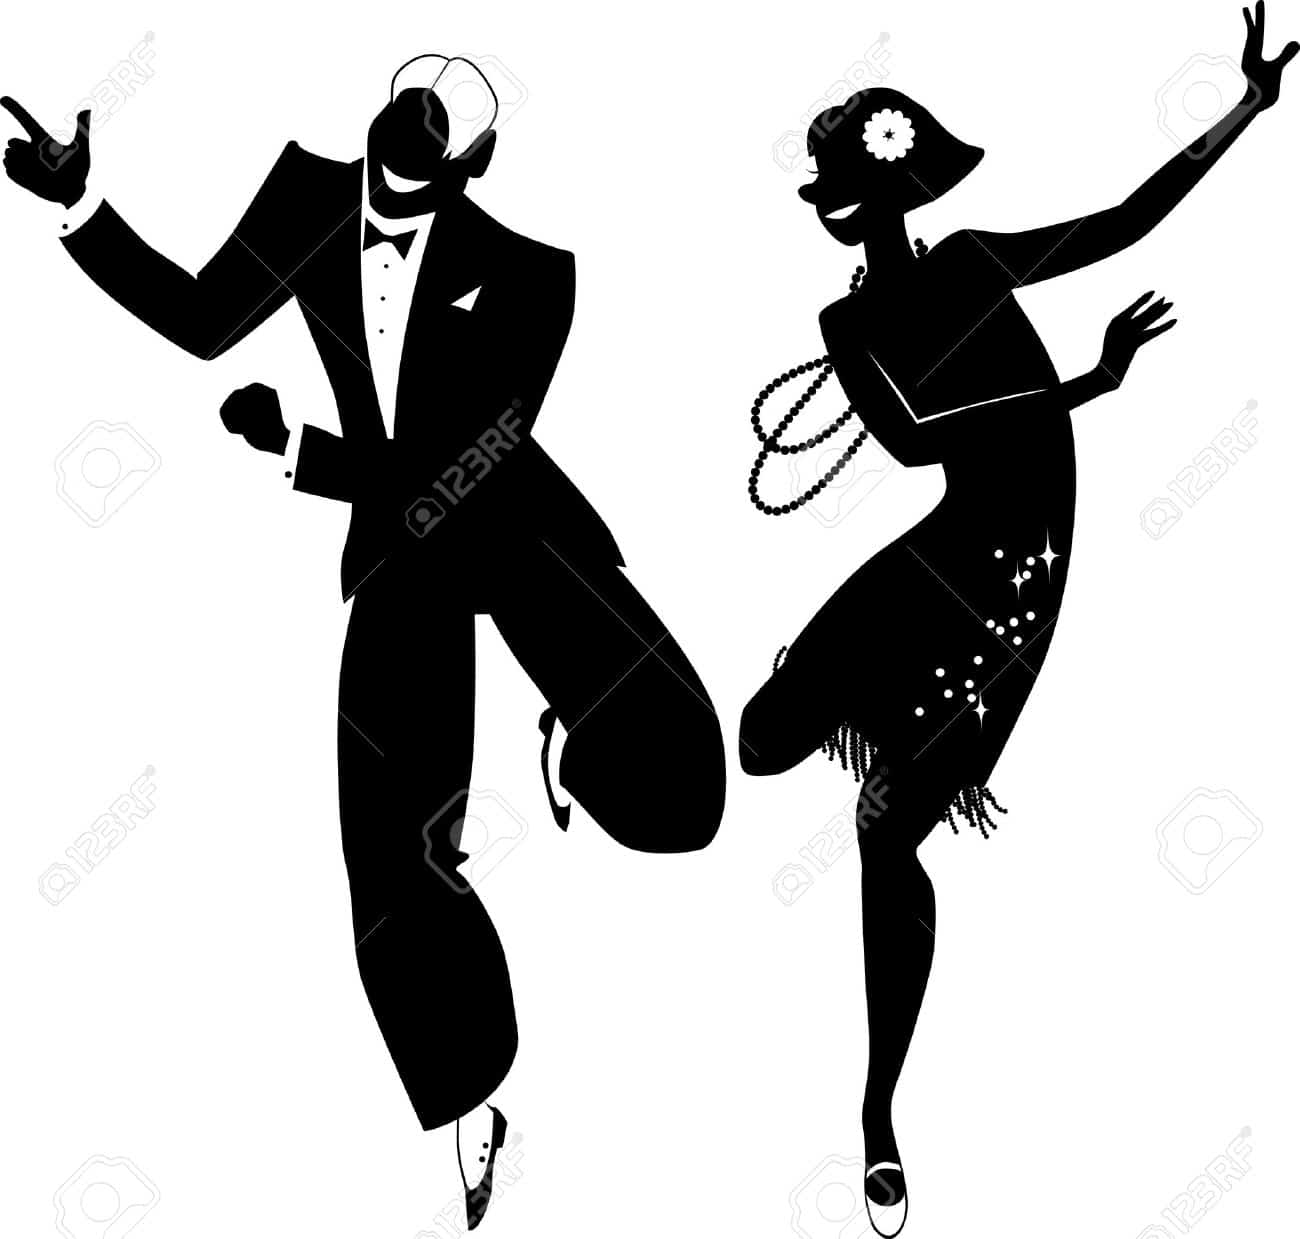 Silhouette de danseurs de Charleston